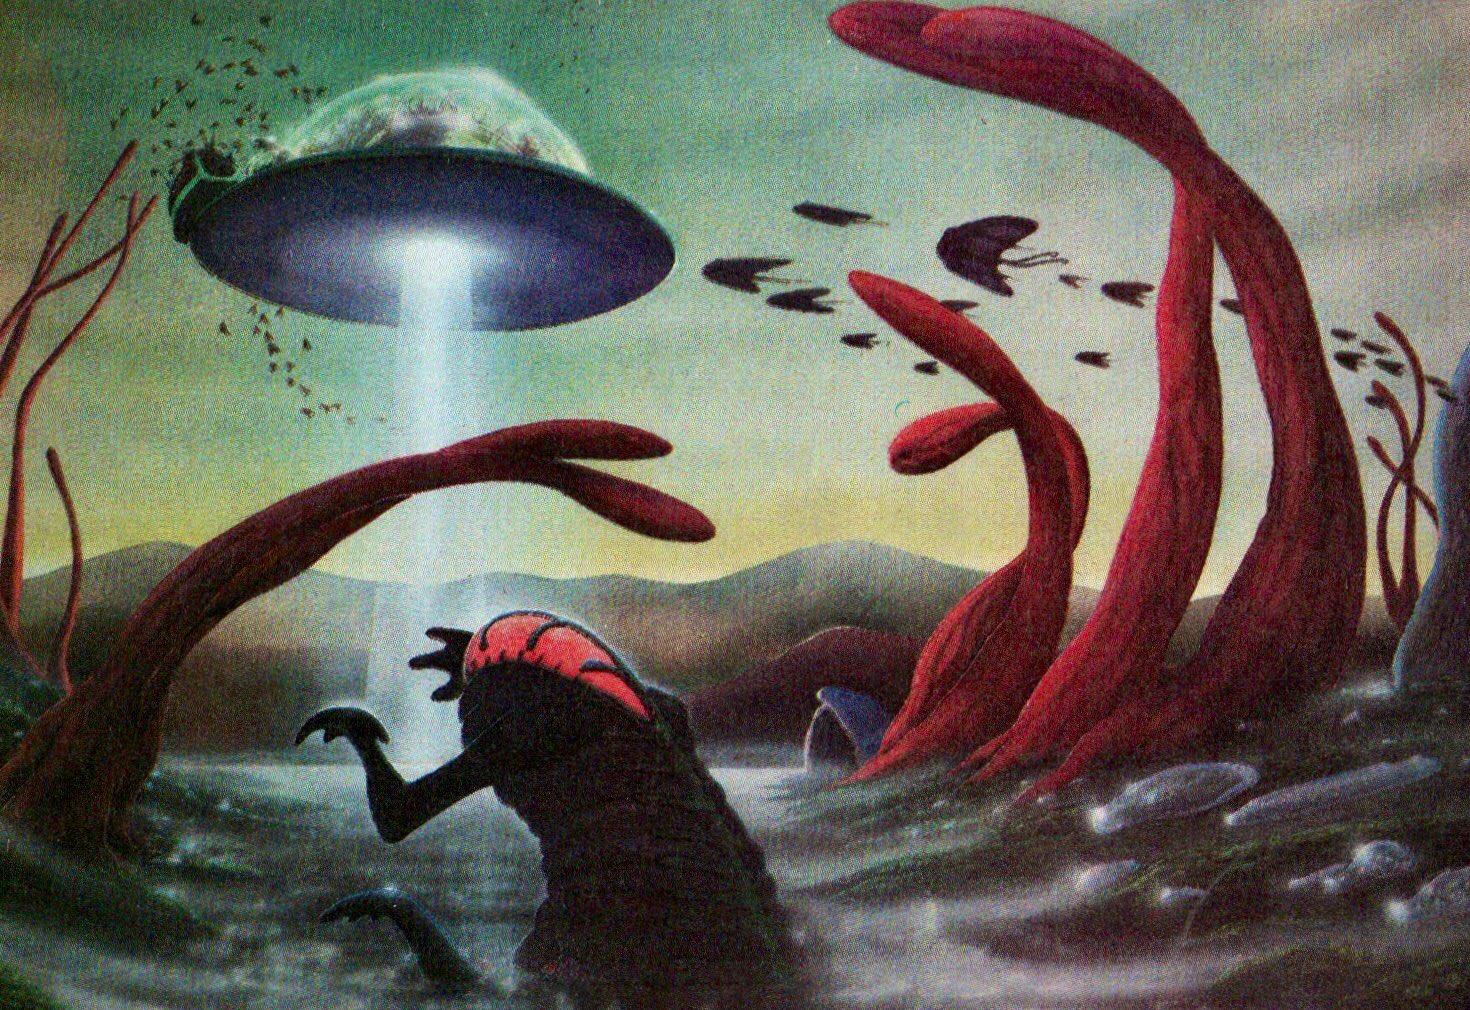 Иллюстрации Карла Кофоеда (4).jpg